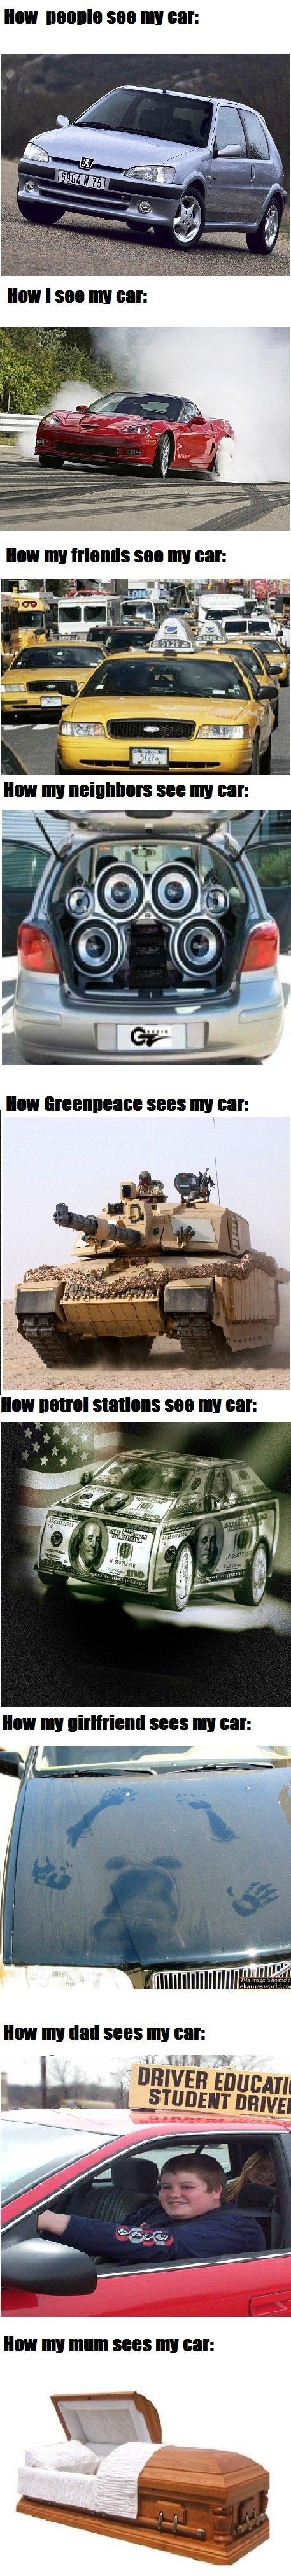 my car. thumbs up or down but don't skip please. HUI. III HID 5885 III Ell:. How i see my car